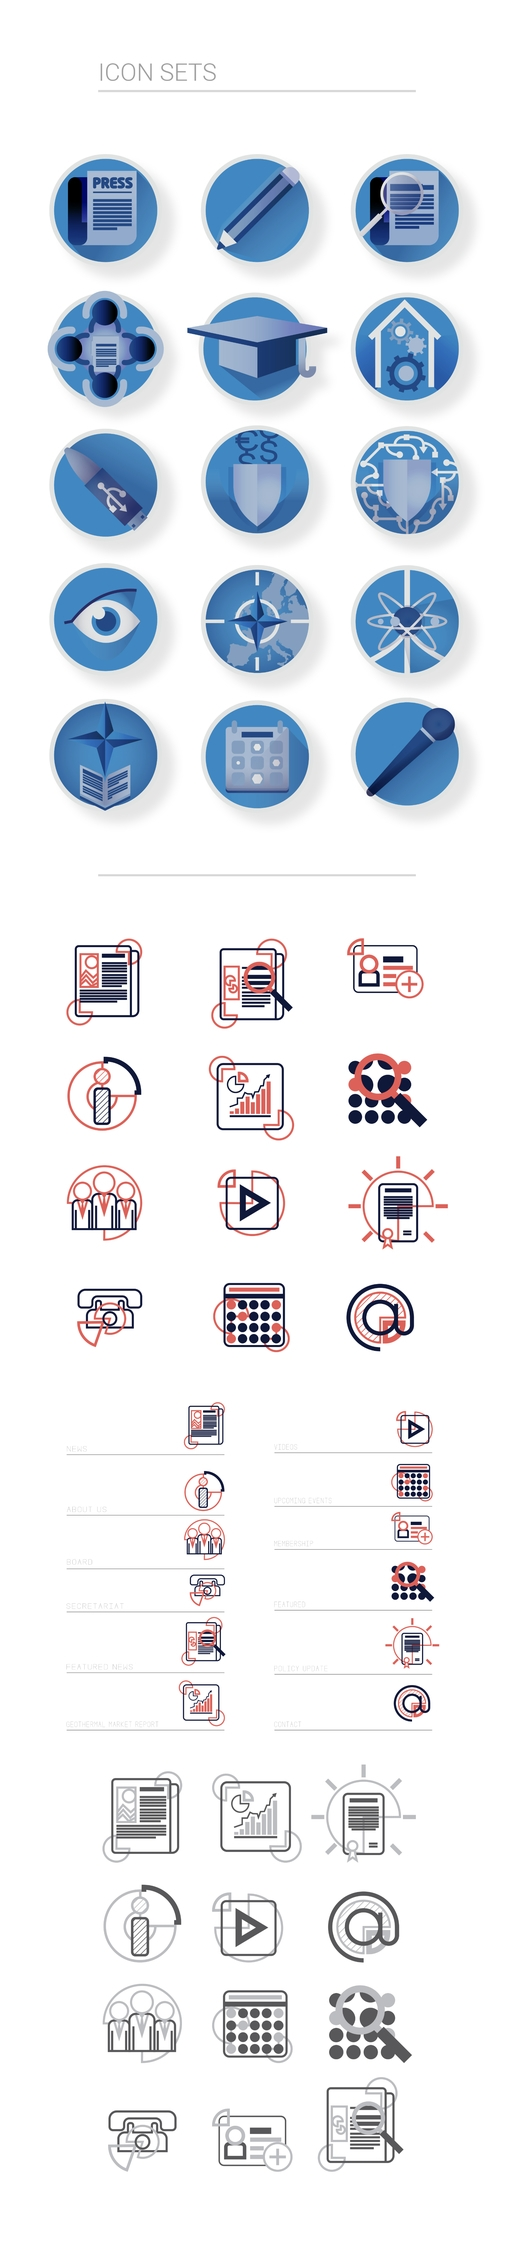 Icons, graphicdesign - krankcrabs | ello